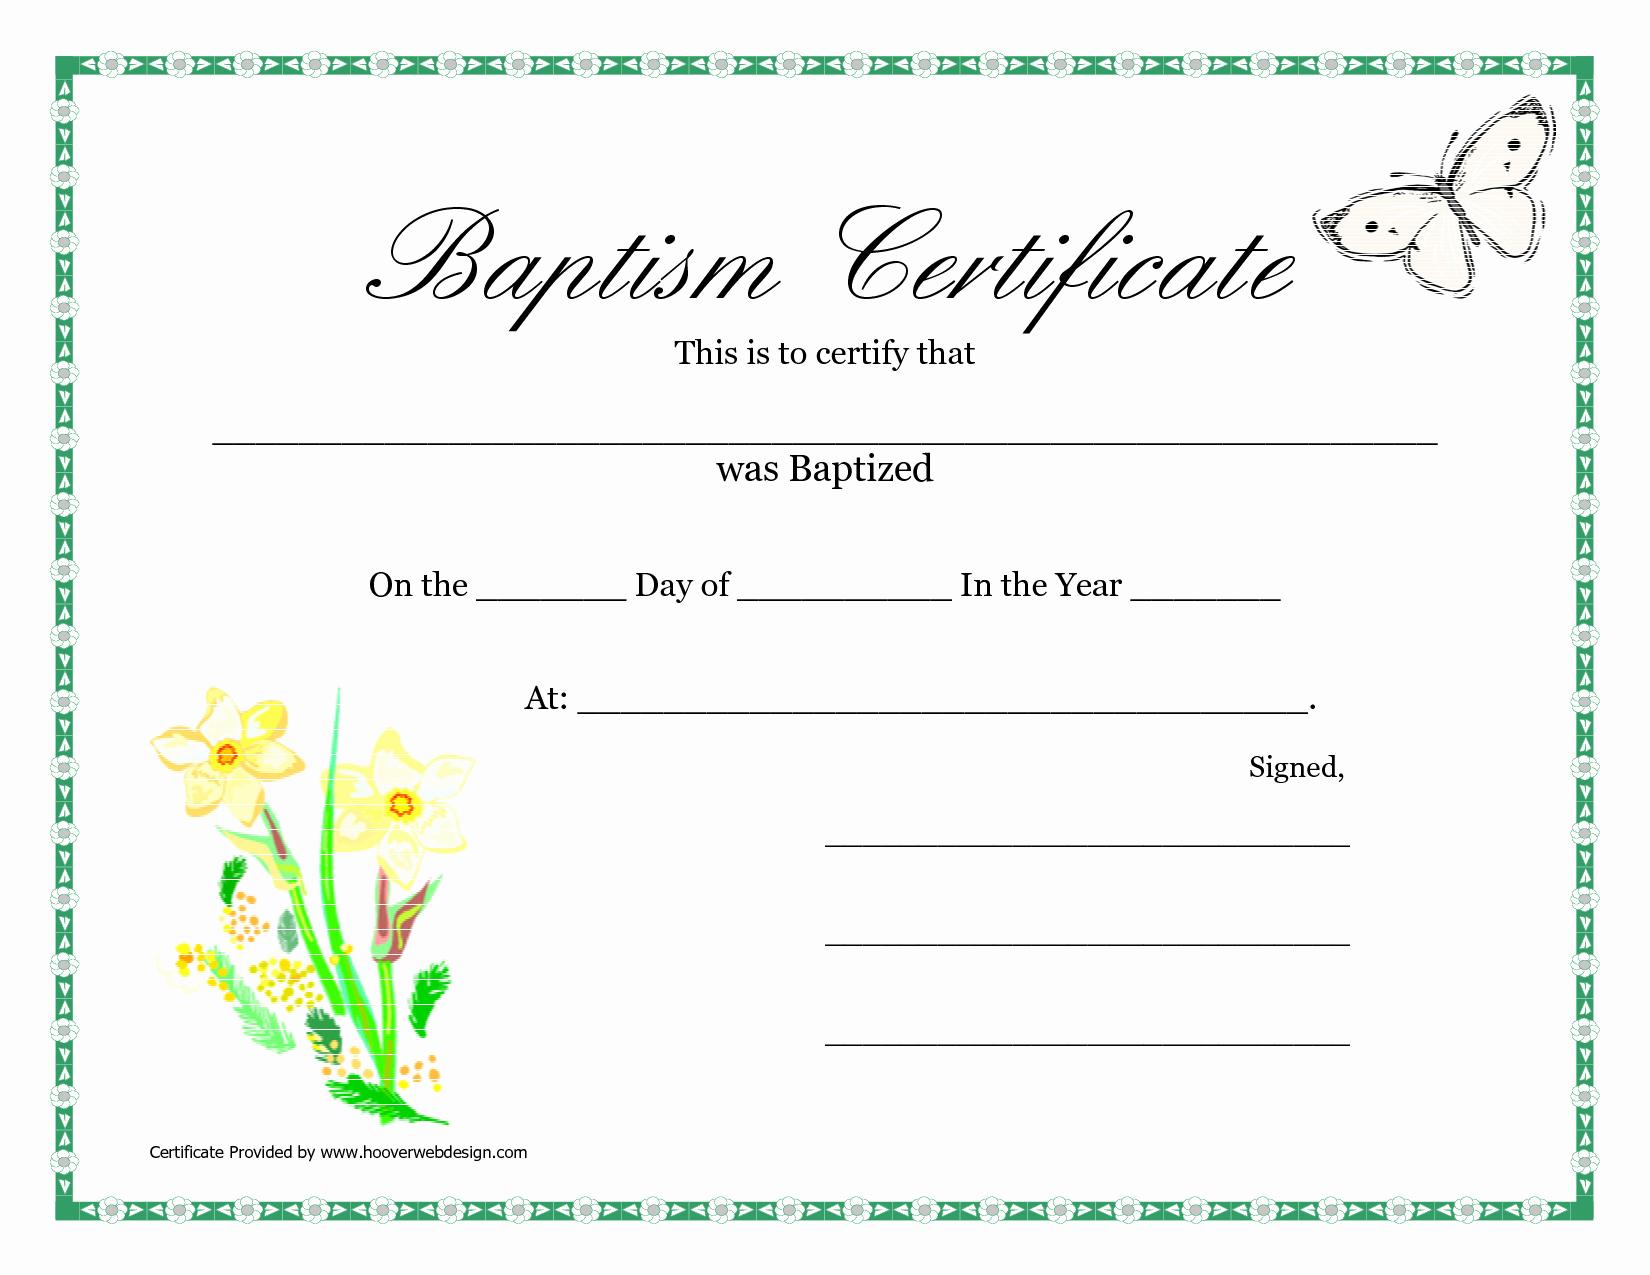 Free Editable Baptism Certificate Template Awesome Printable Certificate Pdfs Baptism